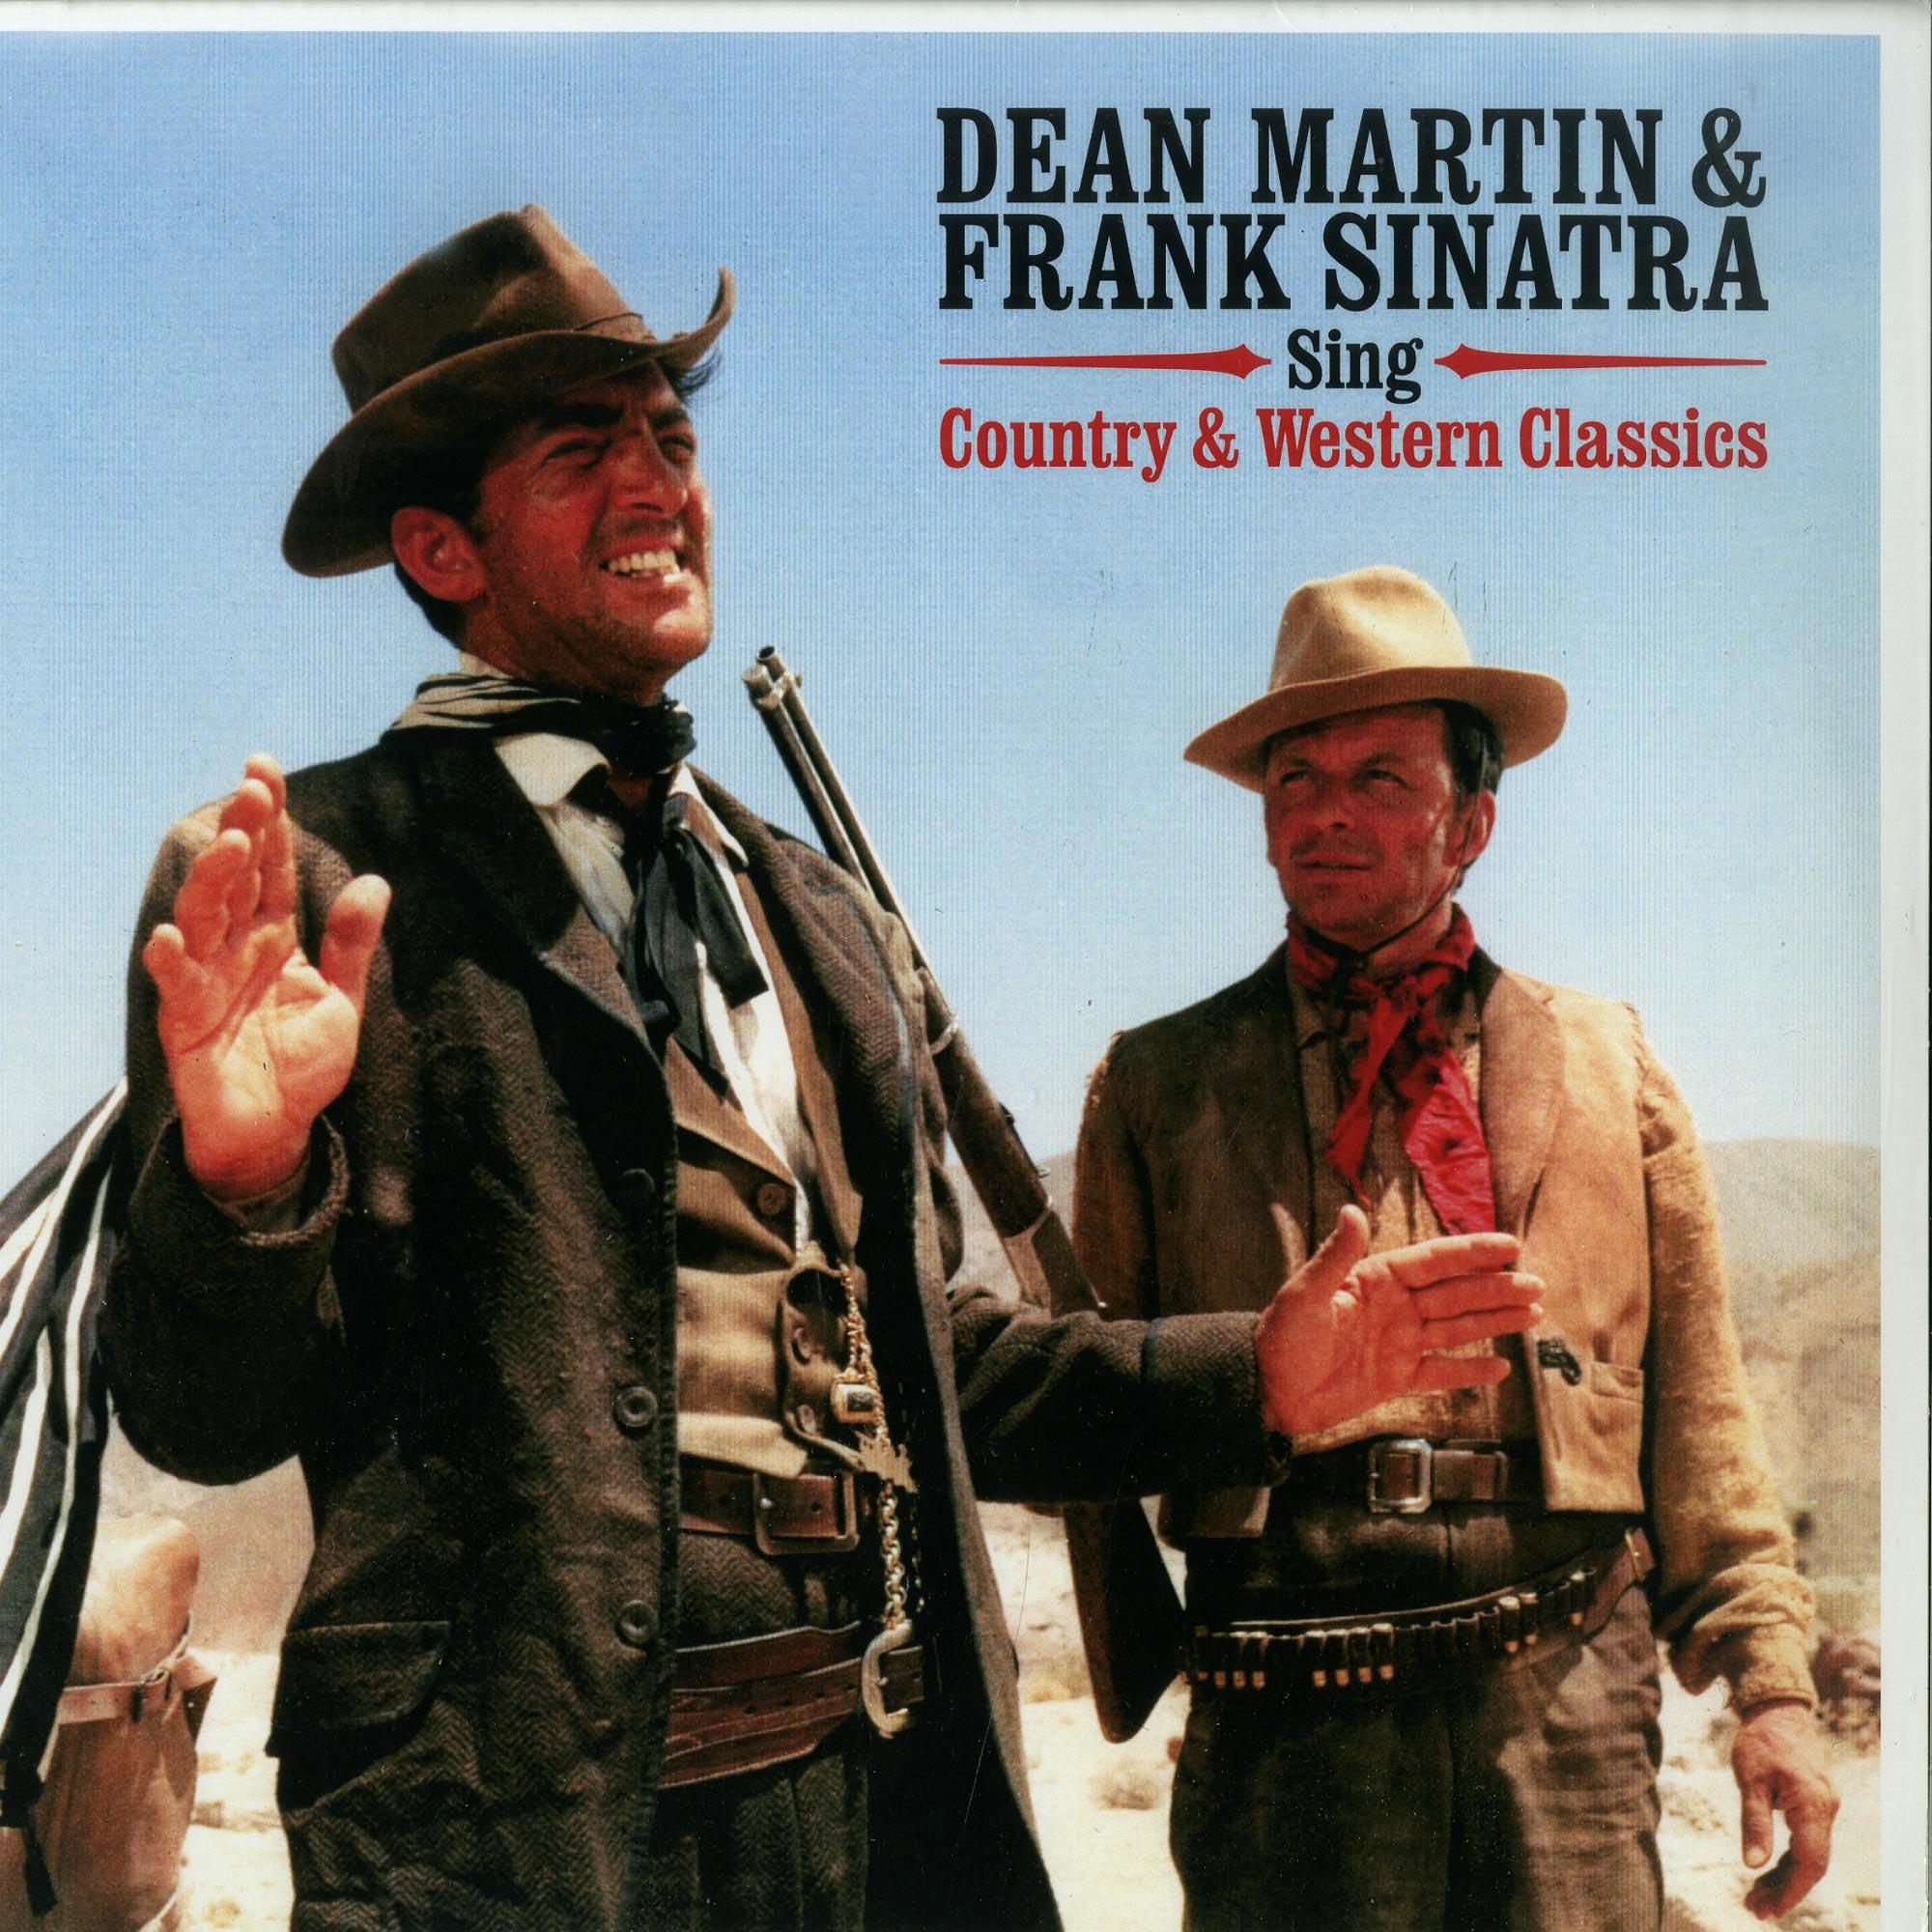 Dean Martin & Frank Sinatra - SING COUNTRY & WESTERN CLASSICS